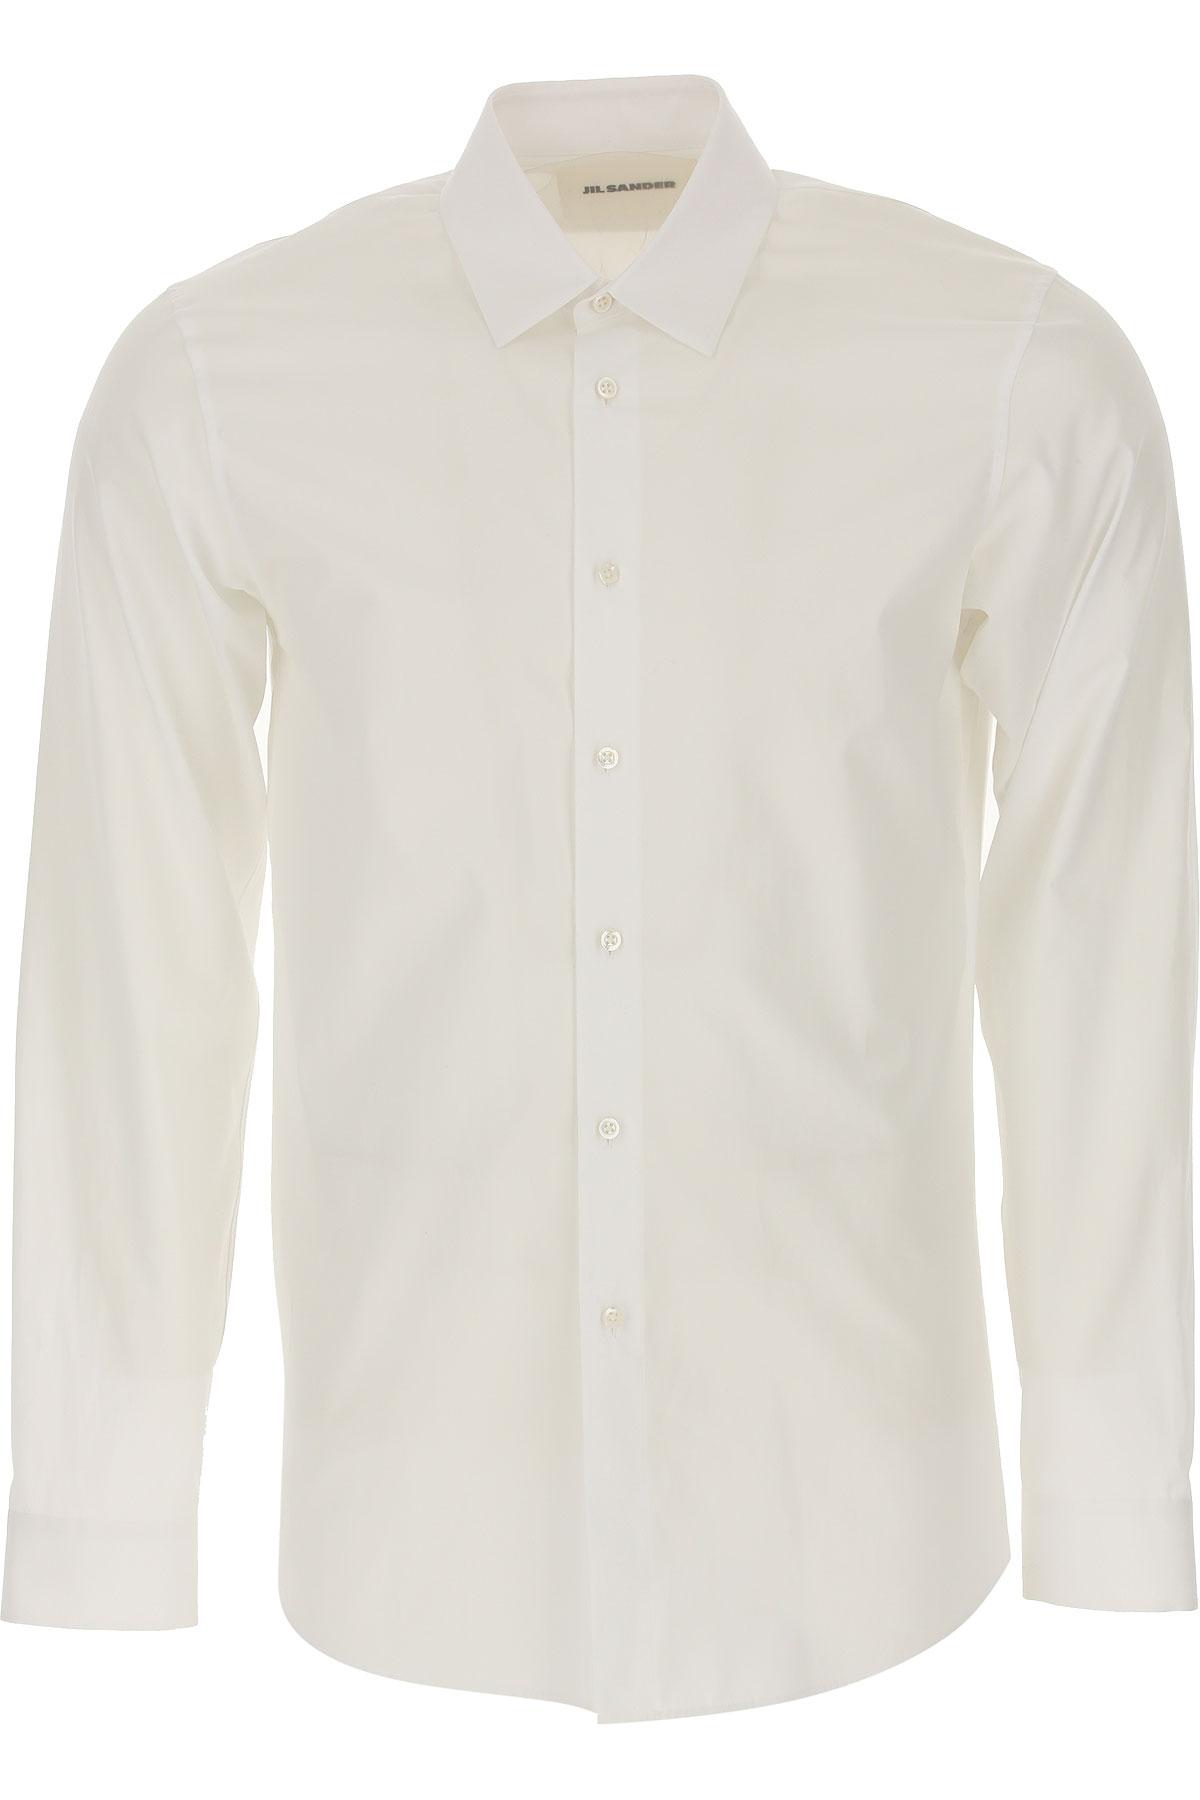 Jil Sander Shirt for Men On Sale, White, Cotton, 2019, 16.5 17